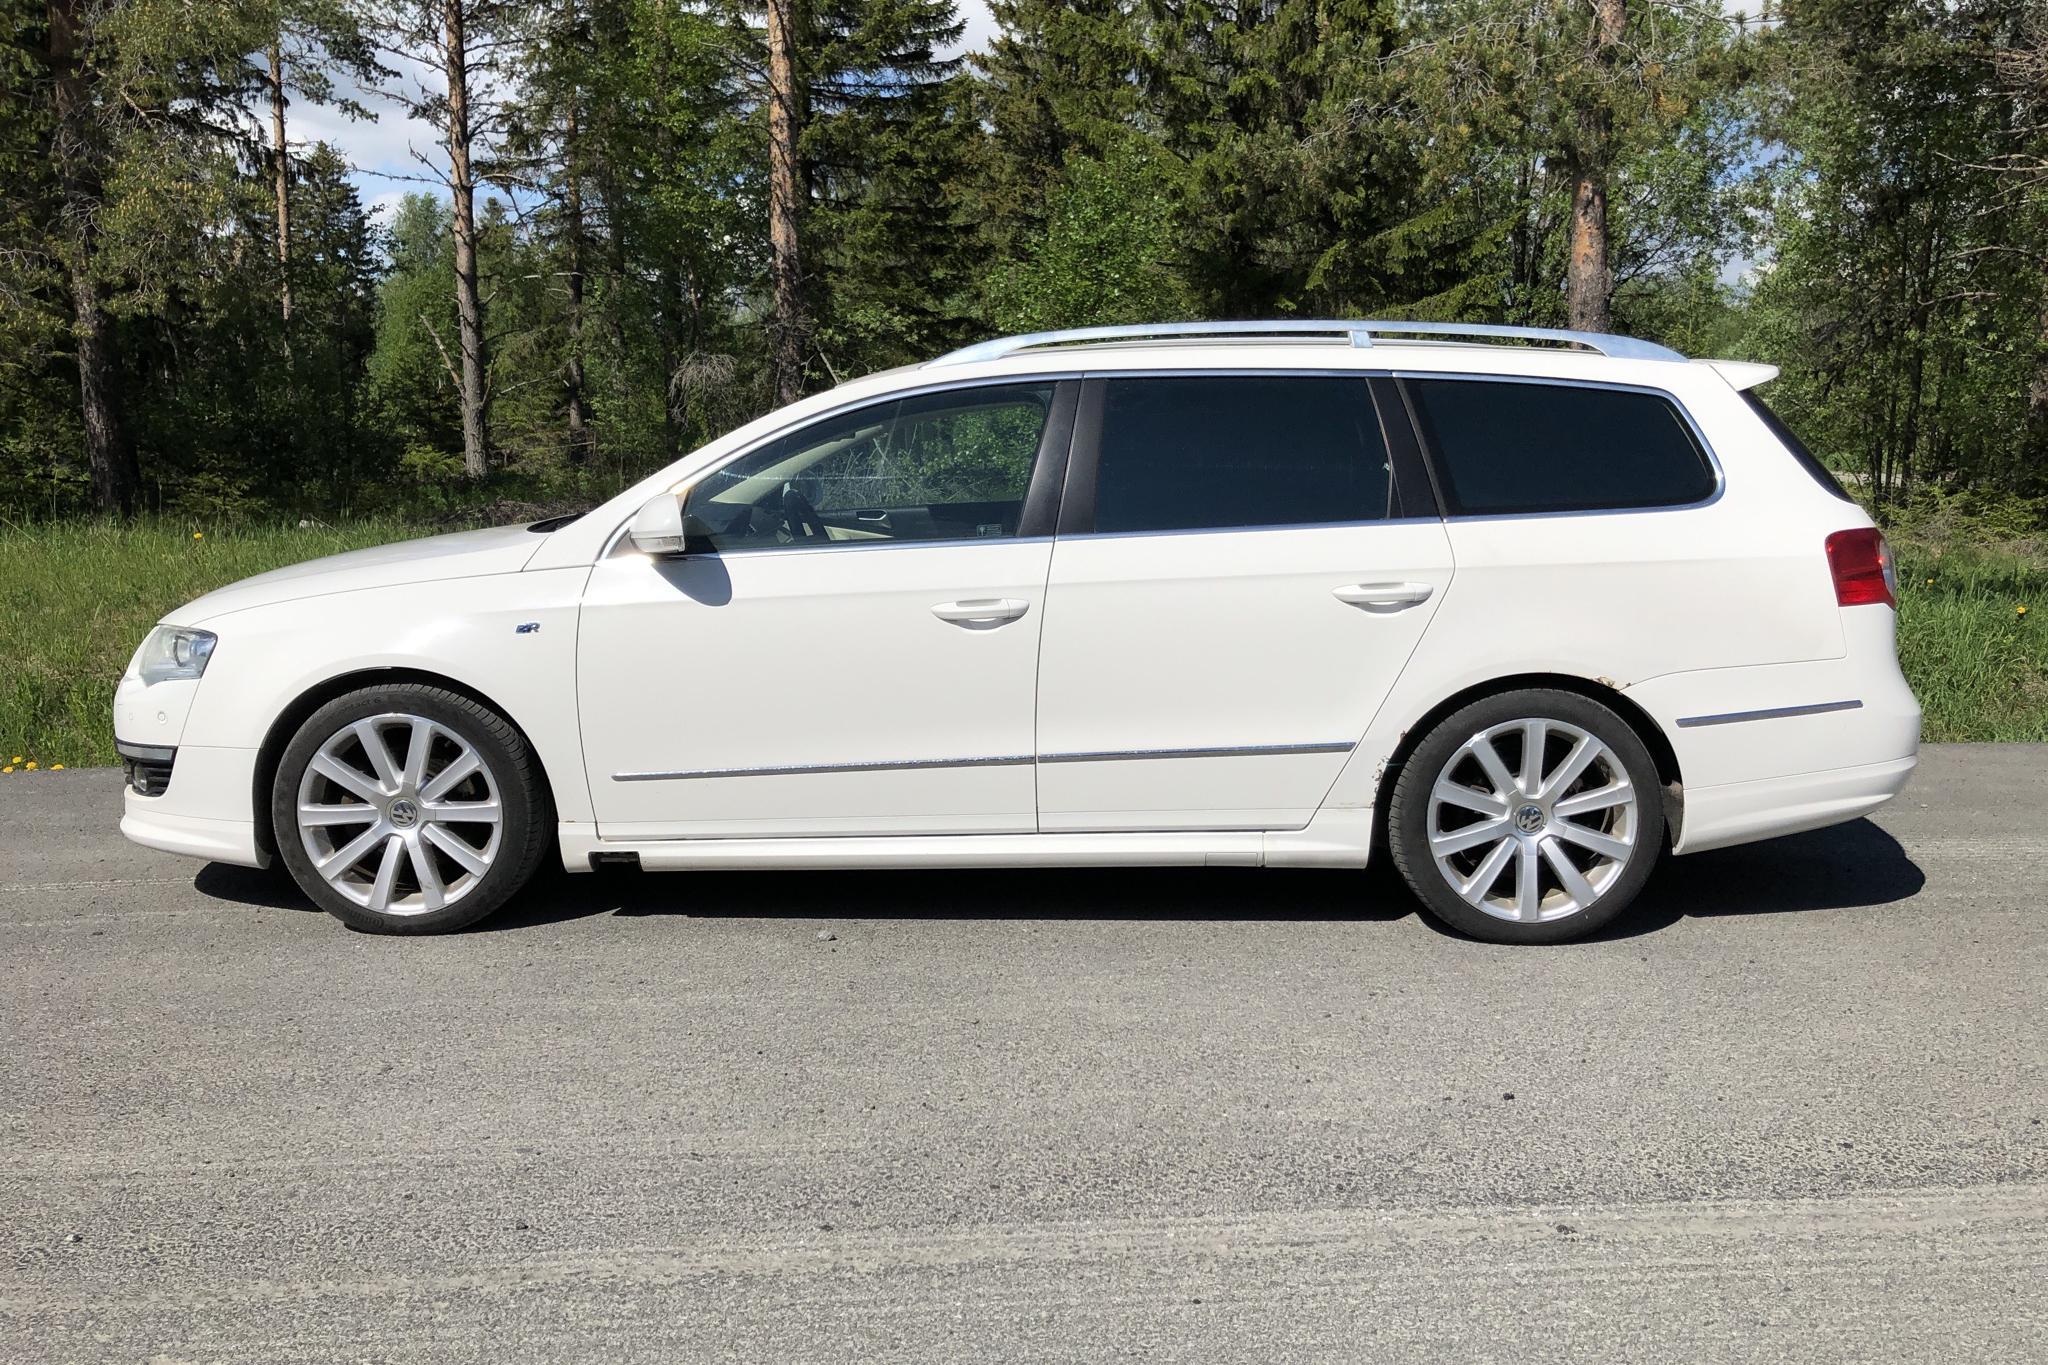 VW Passat 2.0 TDI 4-Motion Variant (170hk) - 215 780 km - Automatic - white - 2010